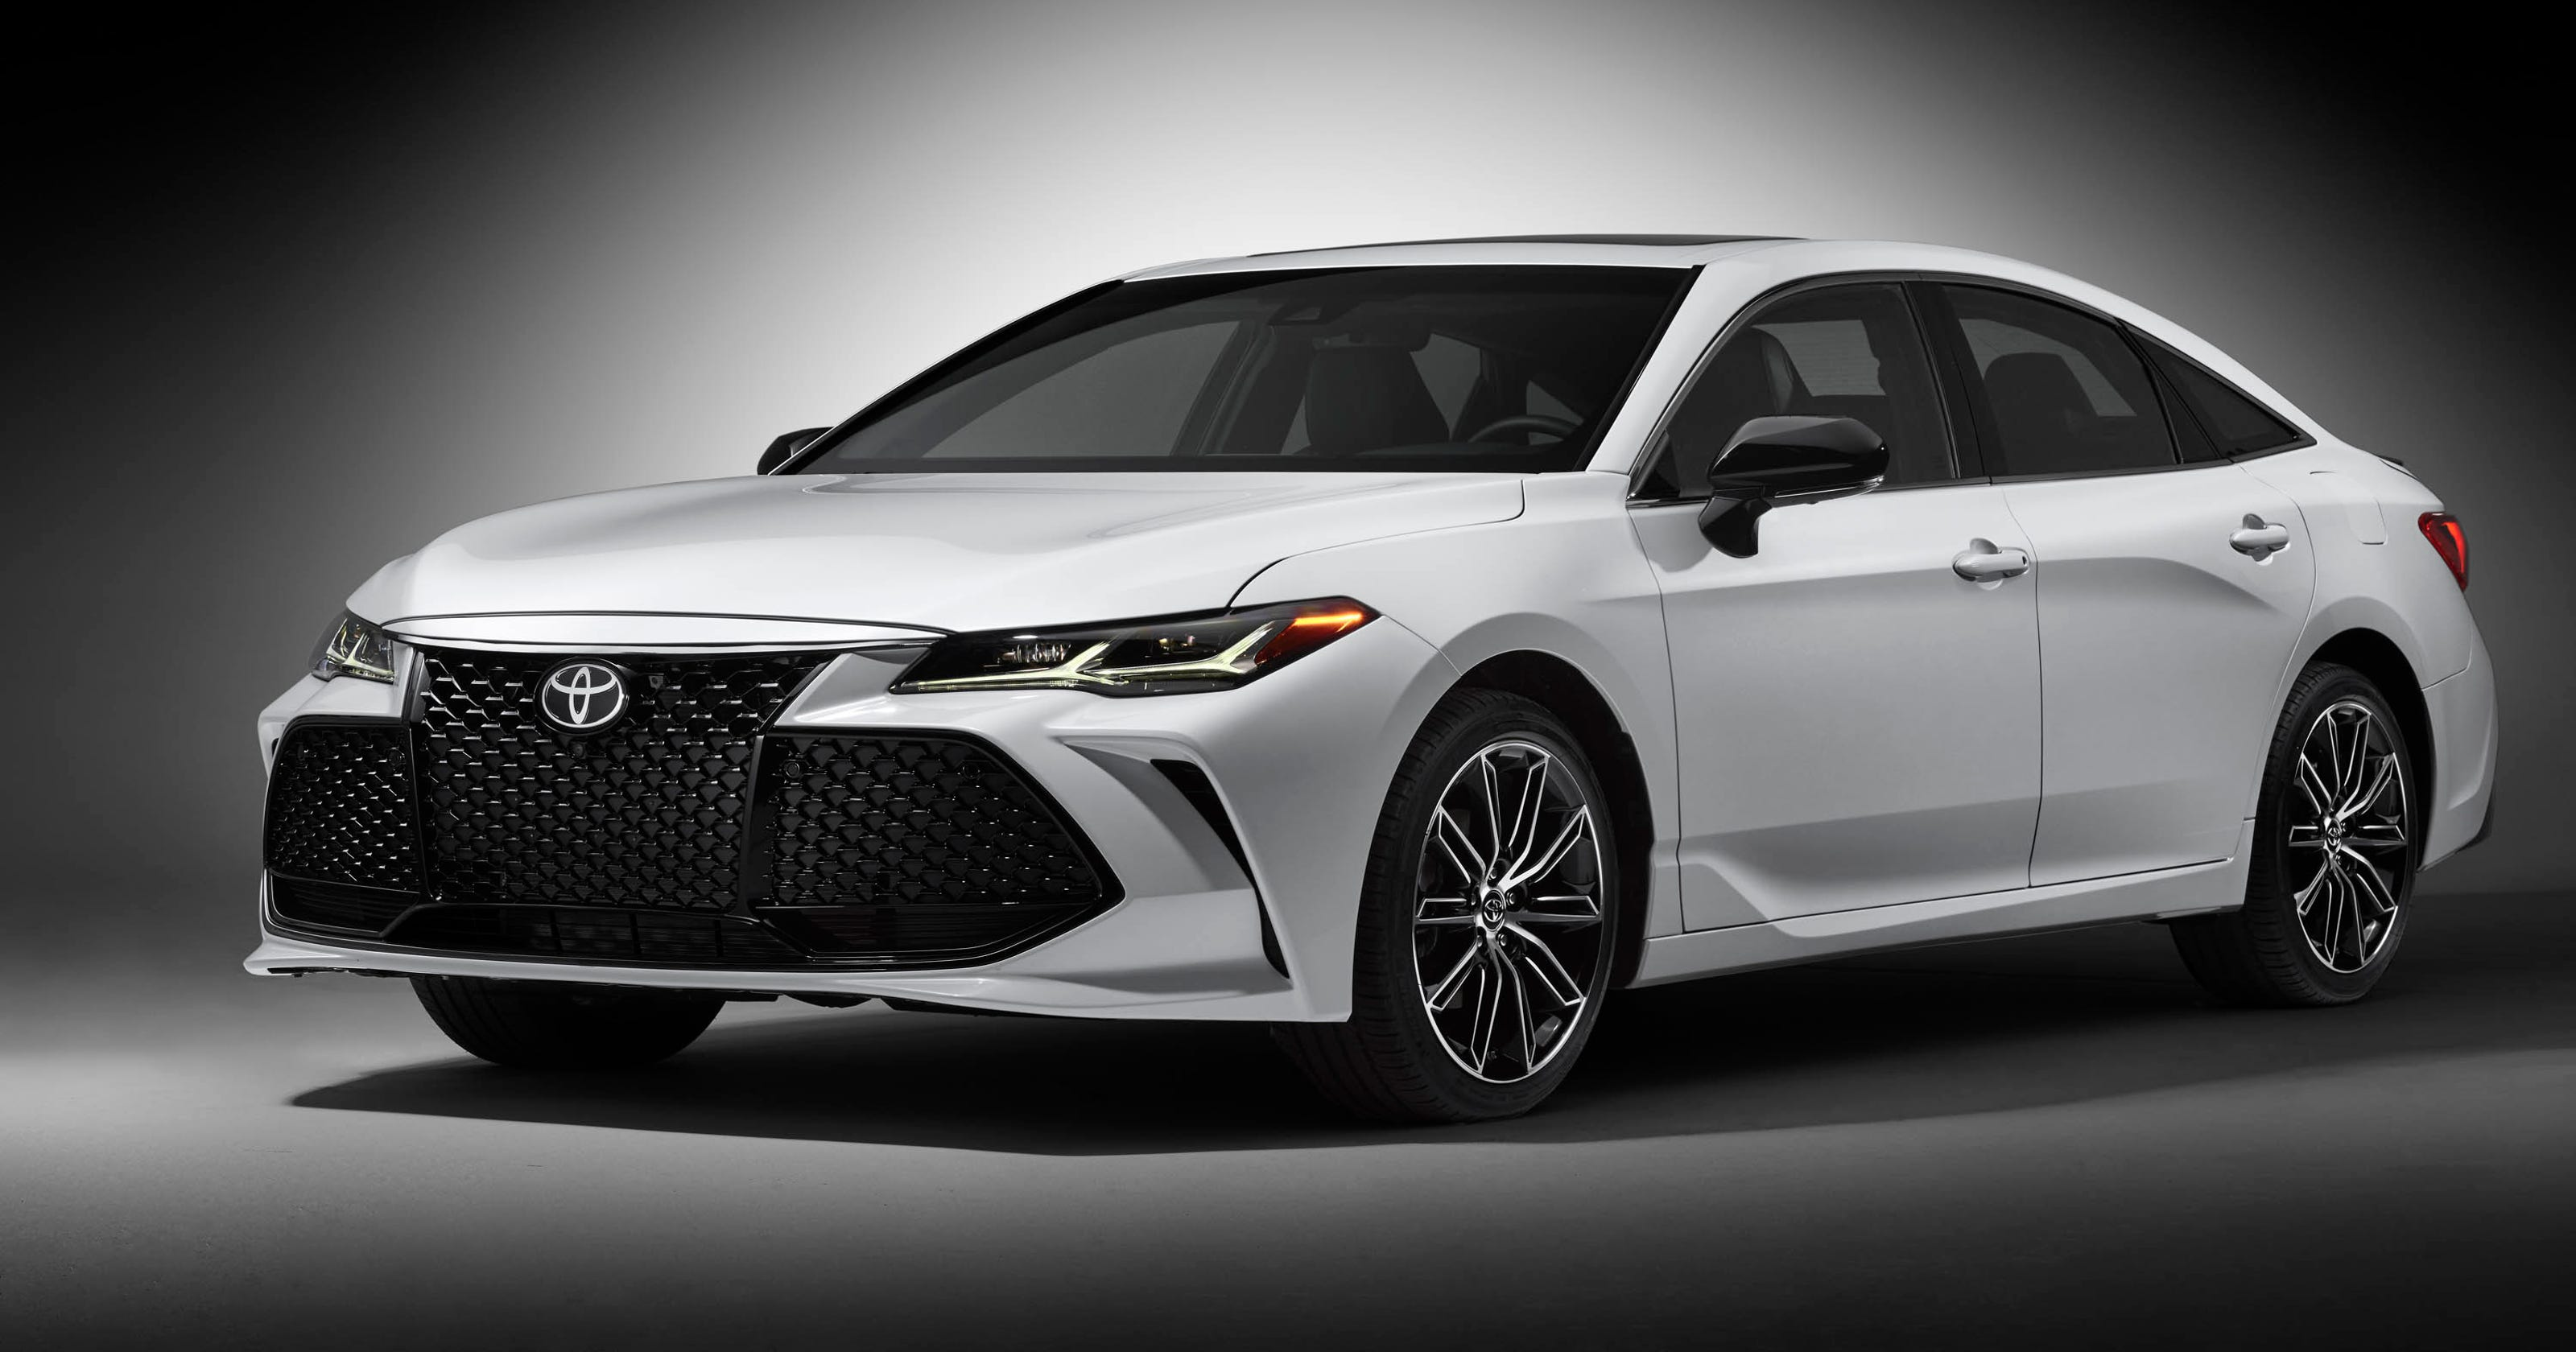 Detroit Auto Show 2019 Toyota Avalon Looks Good But Enters Amid Waning Interest In Sedans